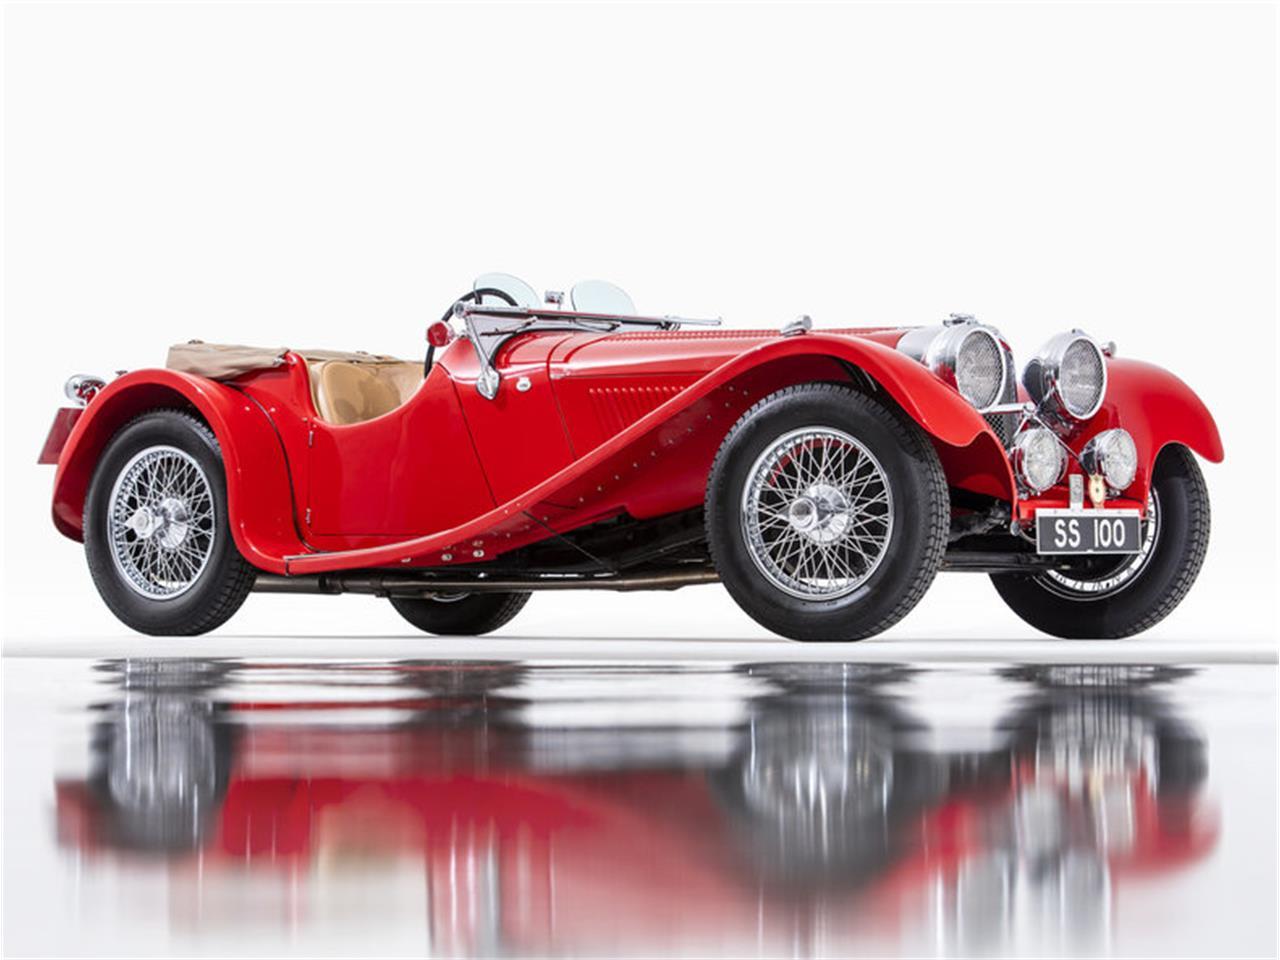 Large Picture of Classic 1938 Jaguar SS100 located in Newport Beach California - $349,000.00 - MZA7